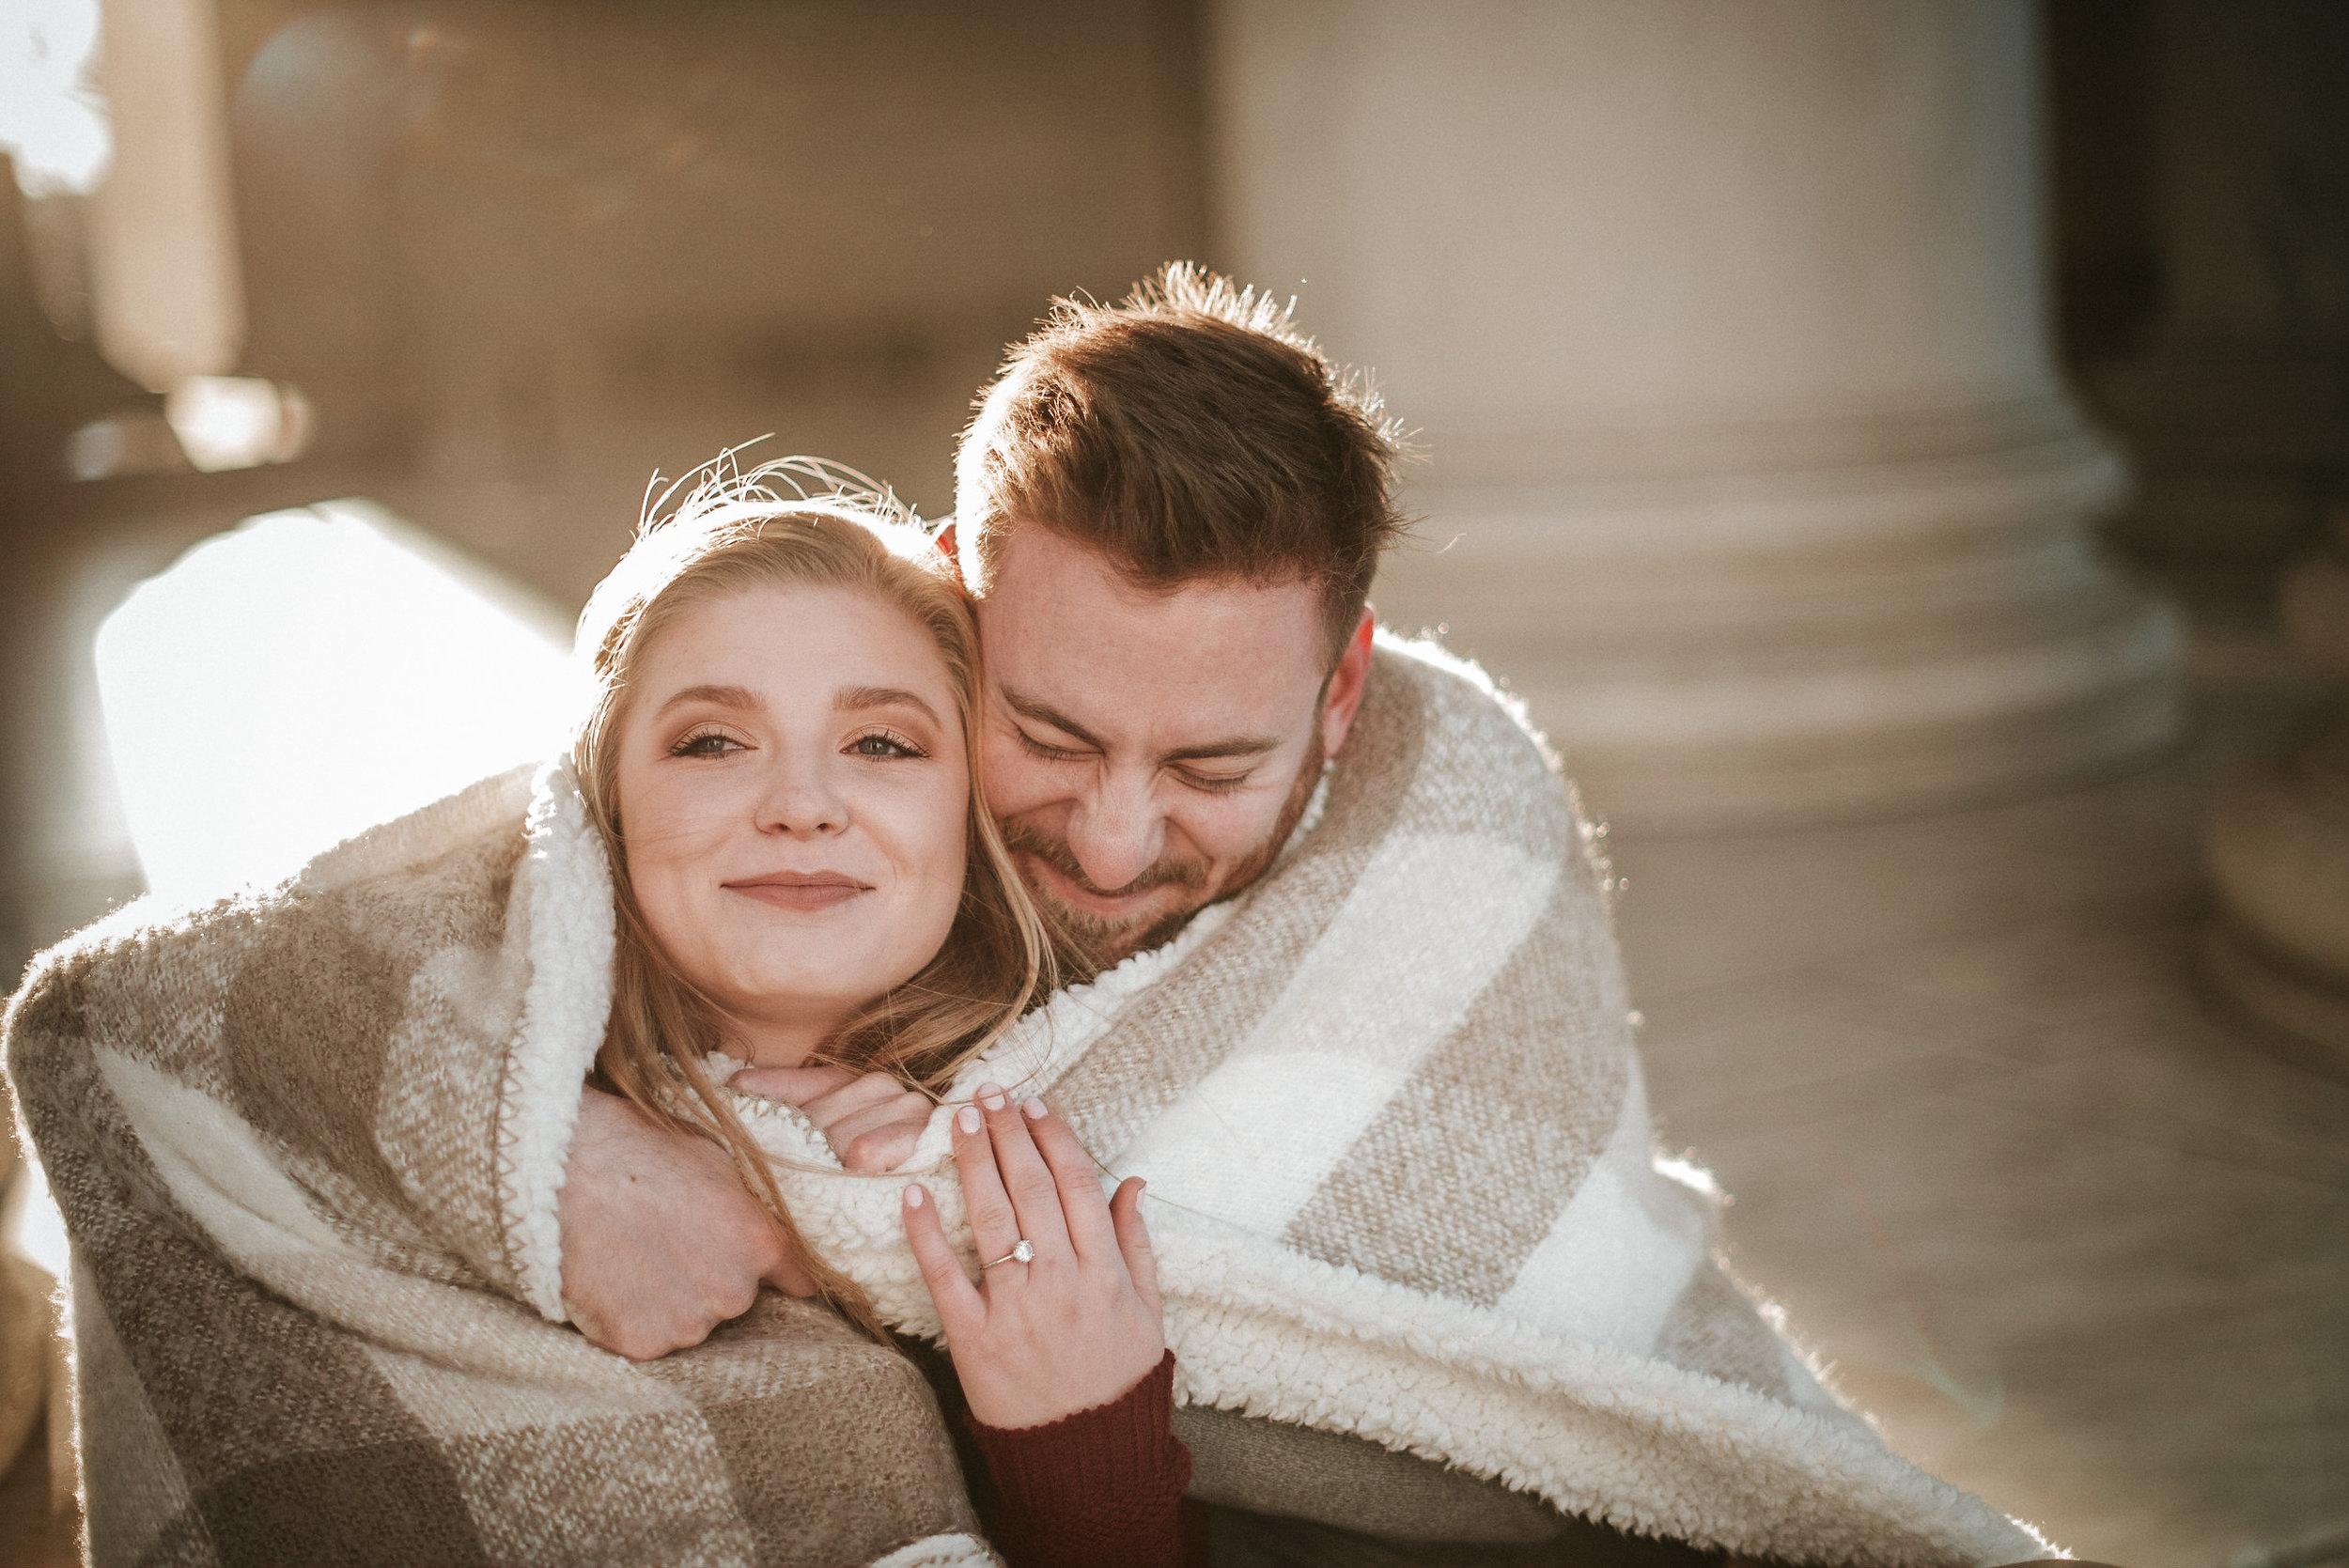 Couple cuddling under blanket